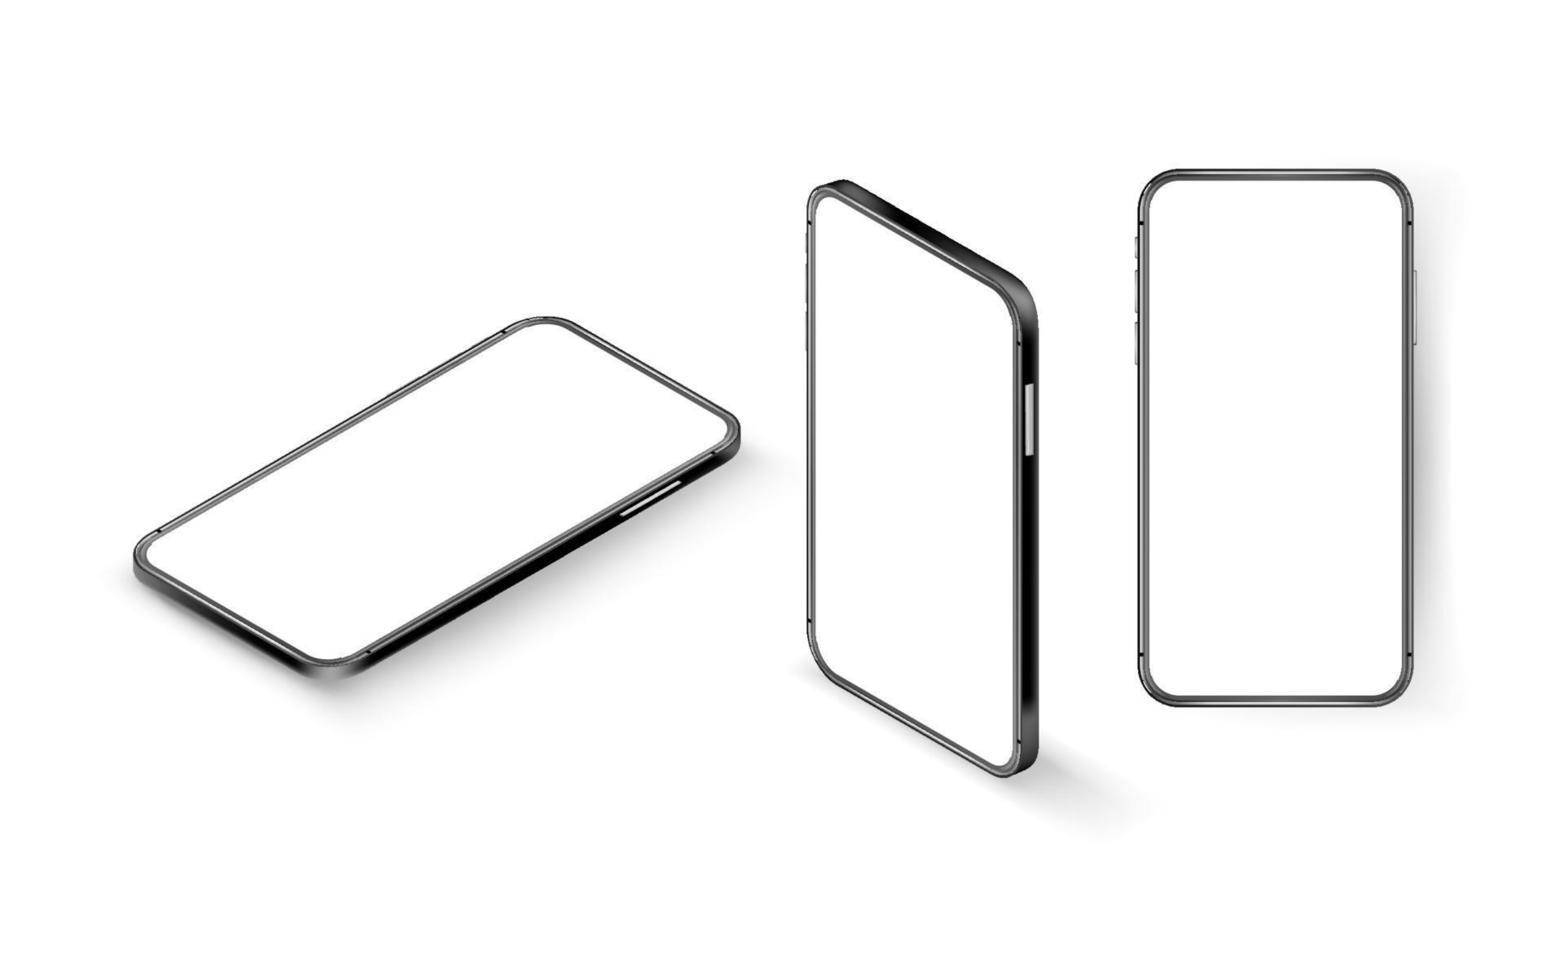 modern smartphone med tom skärm vektor mockup. isometrisk vektorillustration isolerad på vit bakgrund